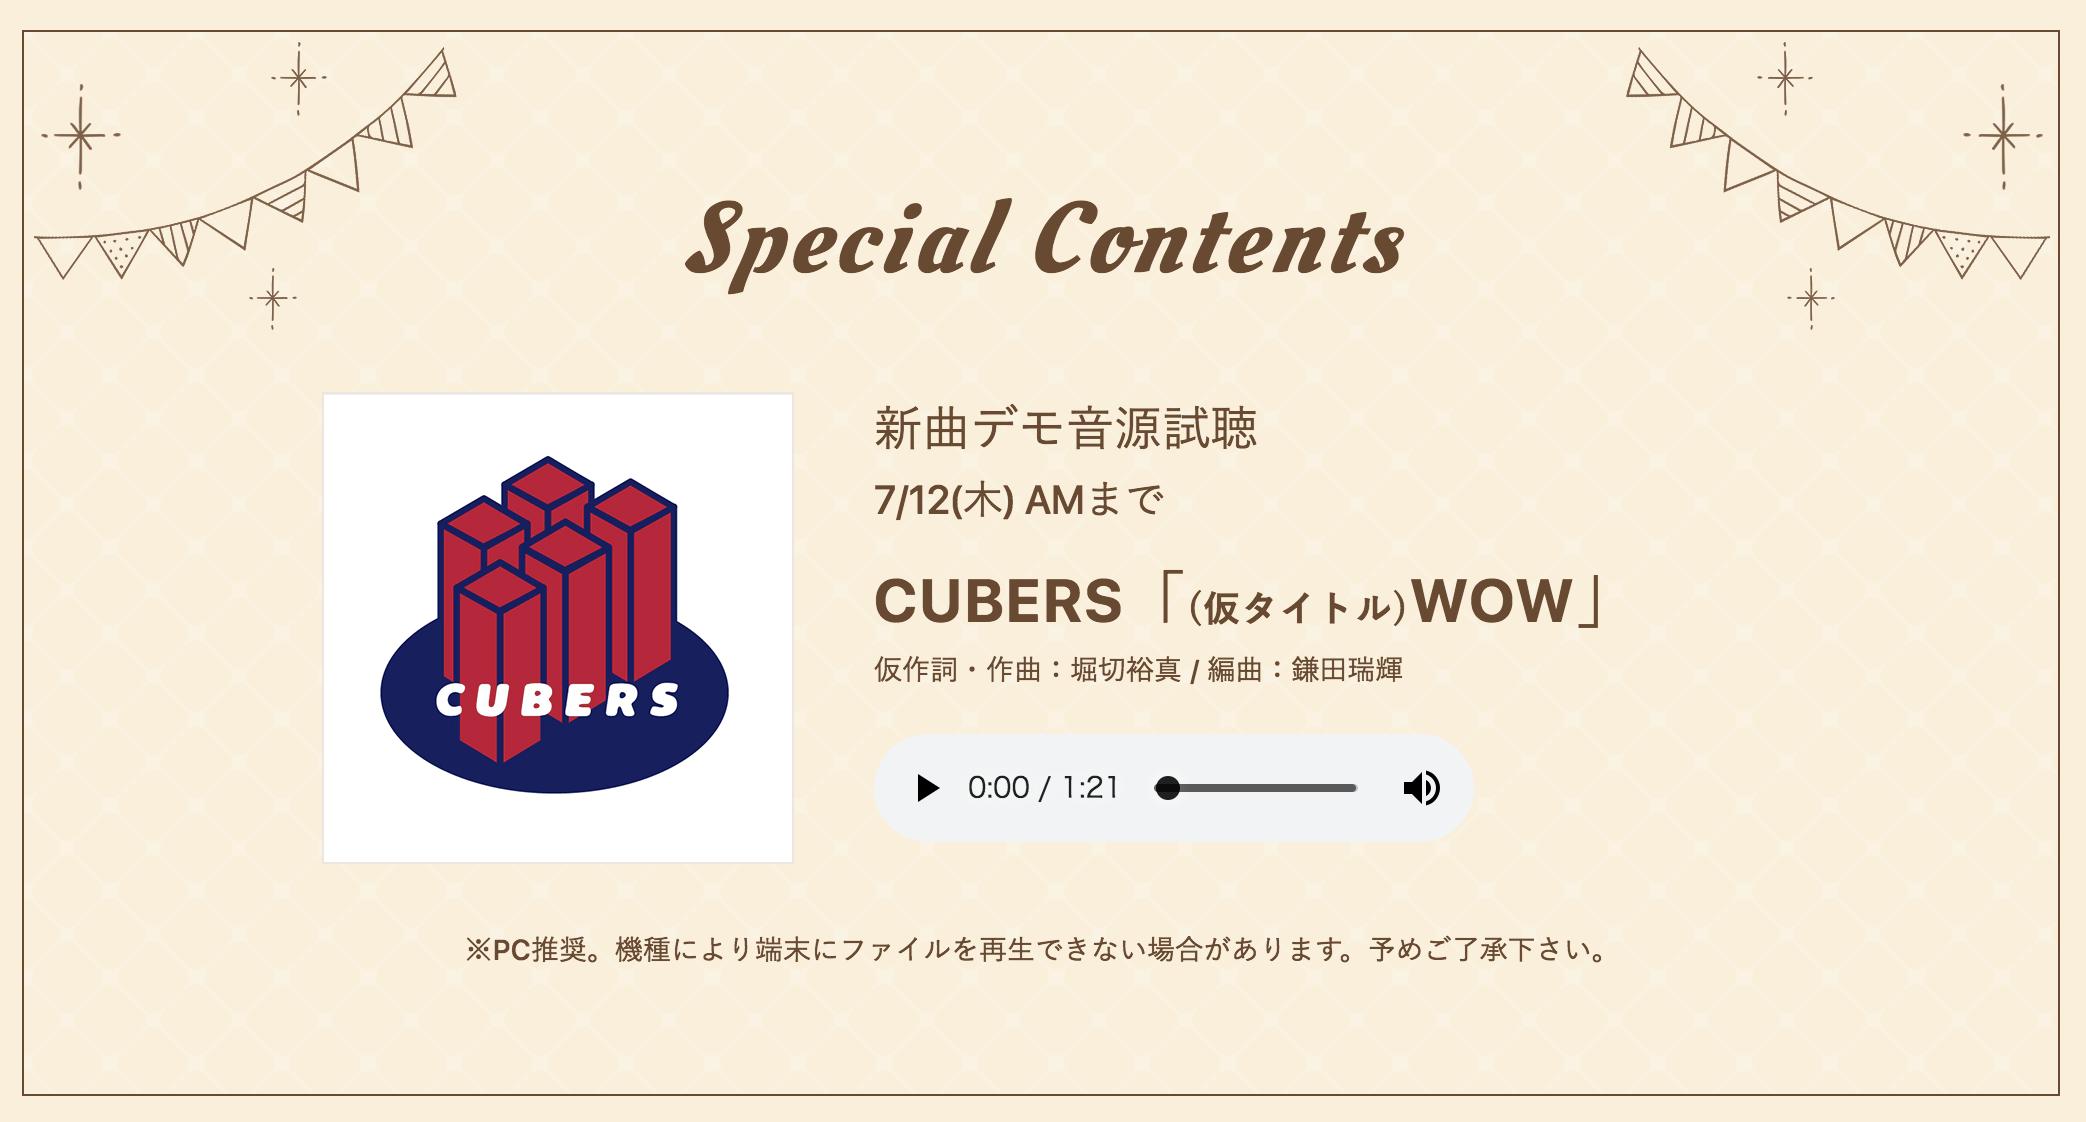 【NEWS】「CUBERS WAKU! WAKU! YEAR 2018-2019」で新曲デモ音源試聴スタート!